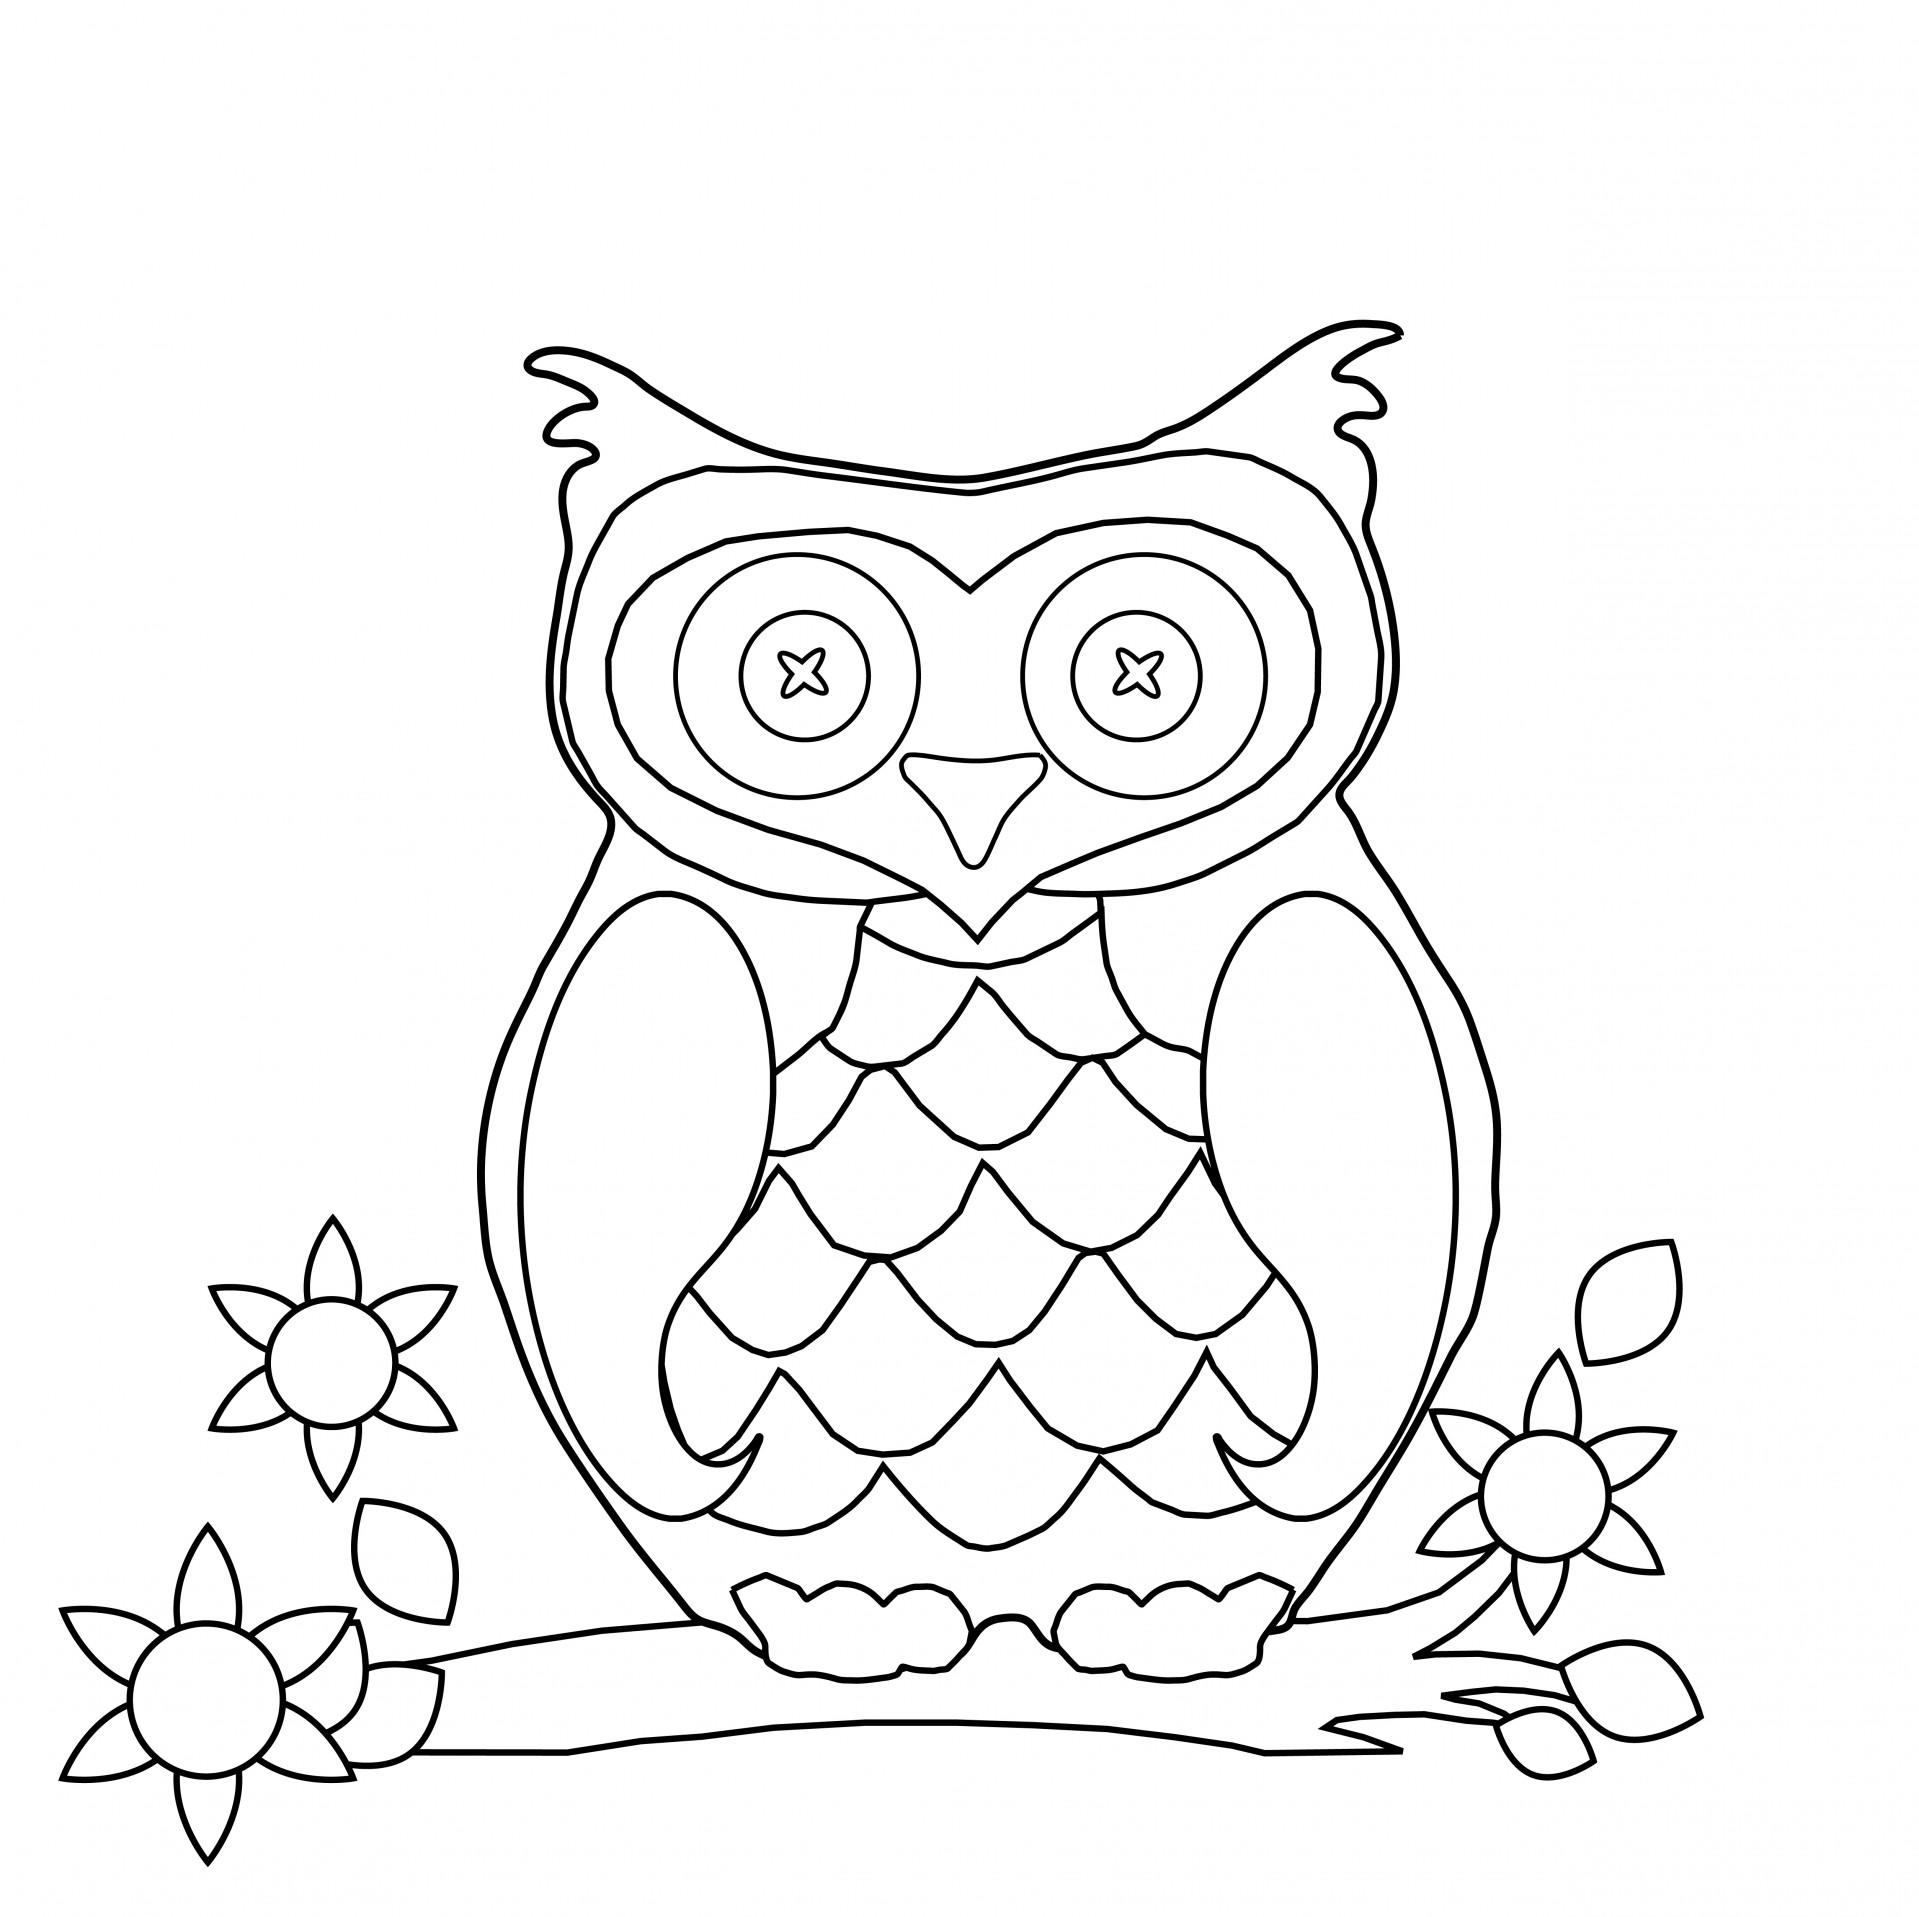 ... Owl Coloring Page Clipart ...-... Owl Coloring Page Clipart ...-11